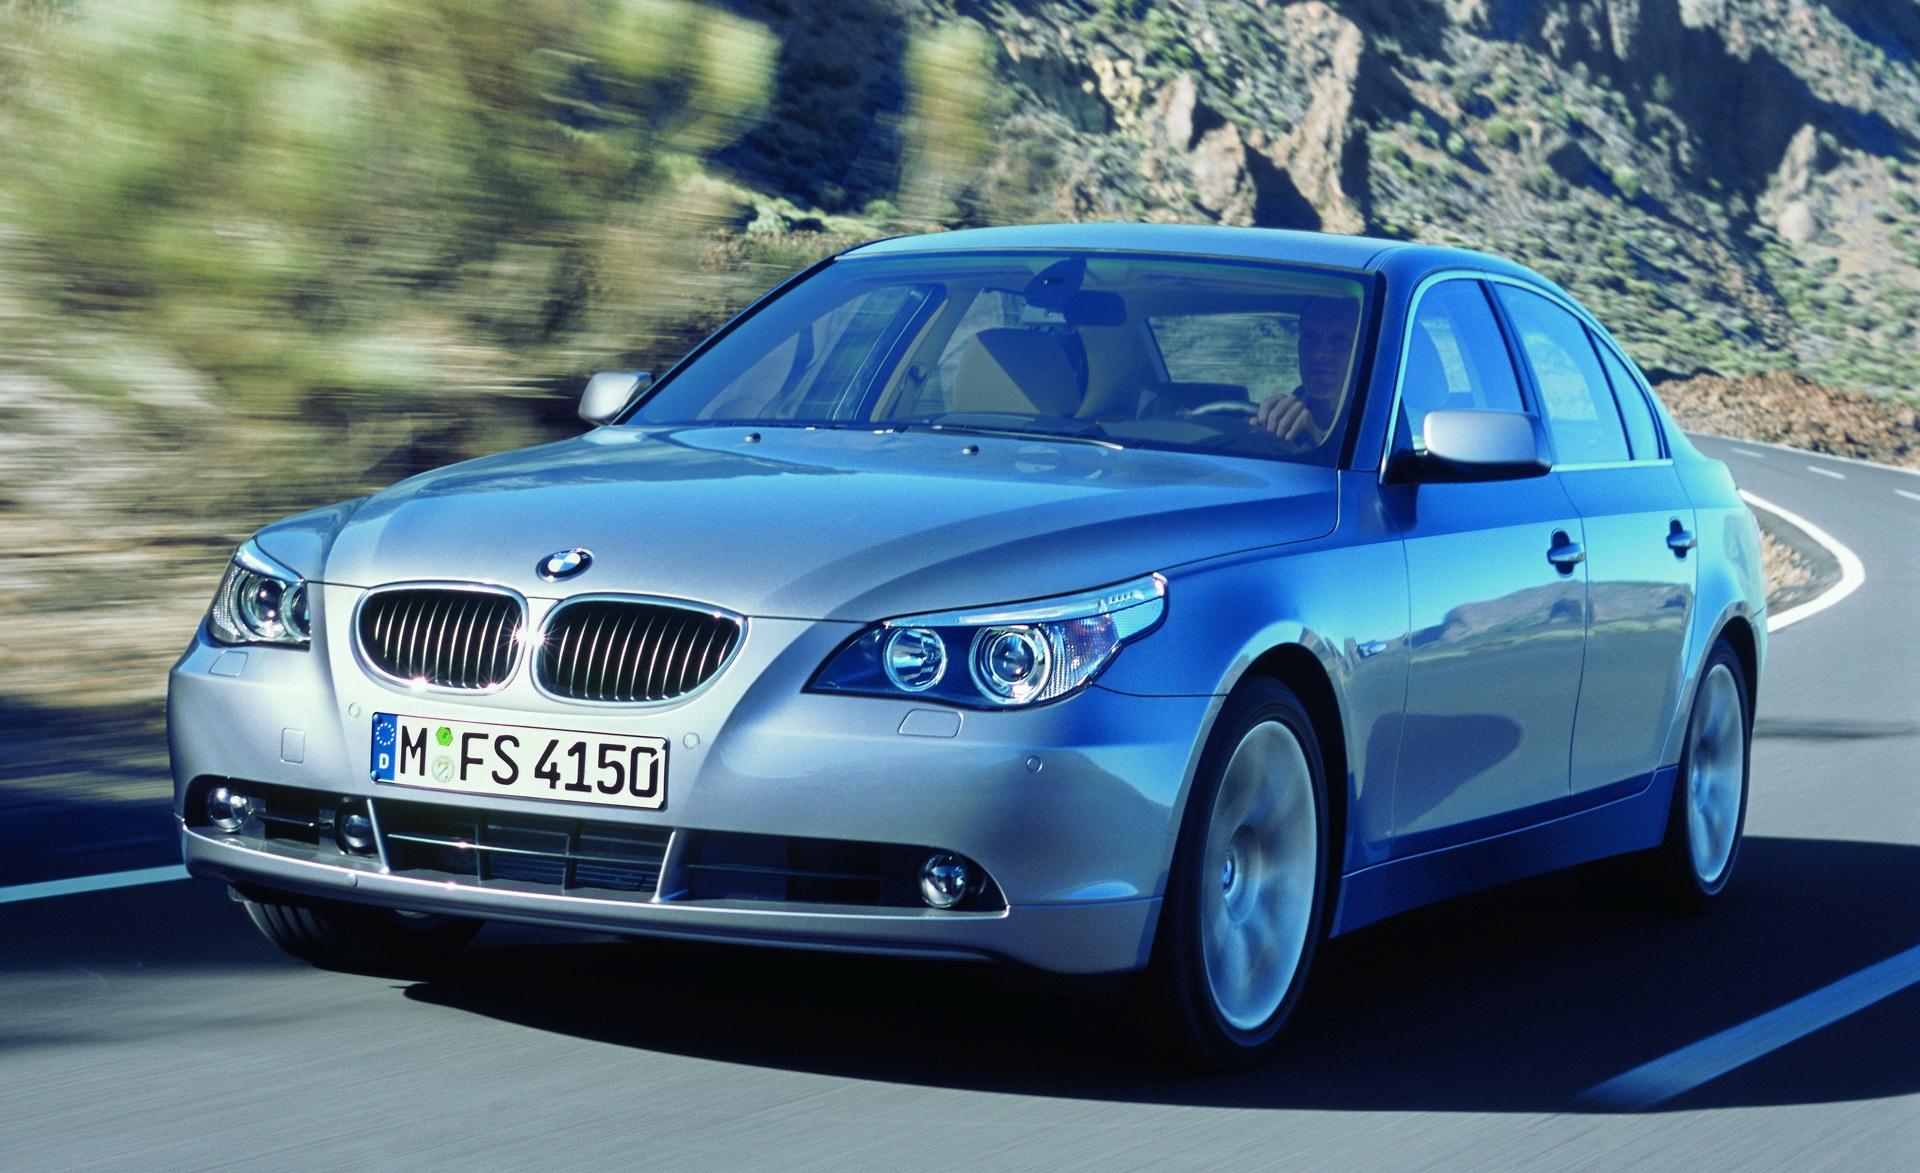 Самая новая «пятерка» — BMW 530i выпуска 2003 года